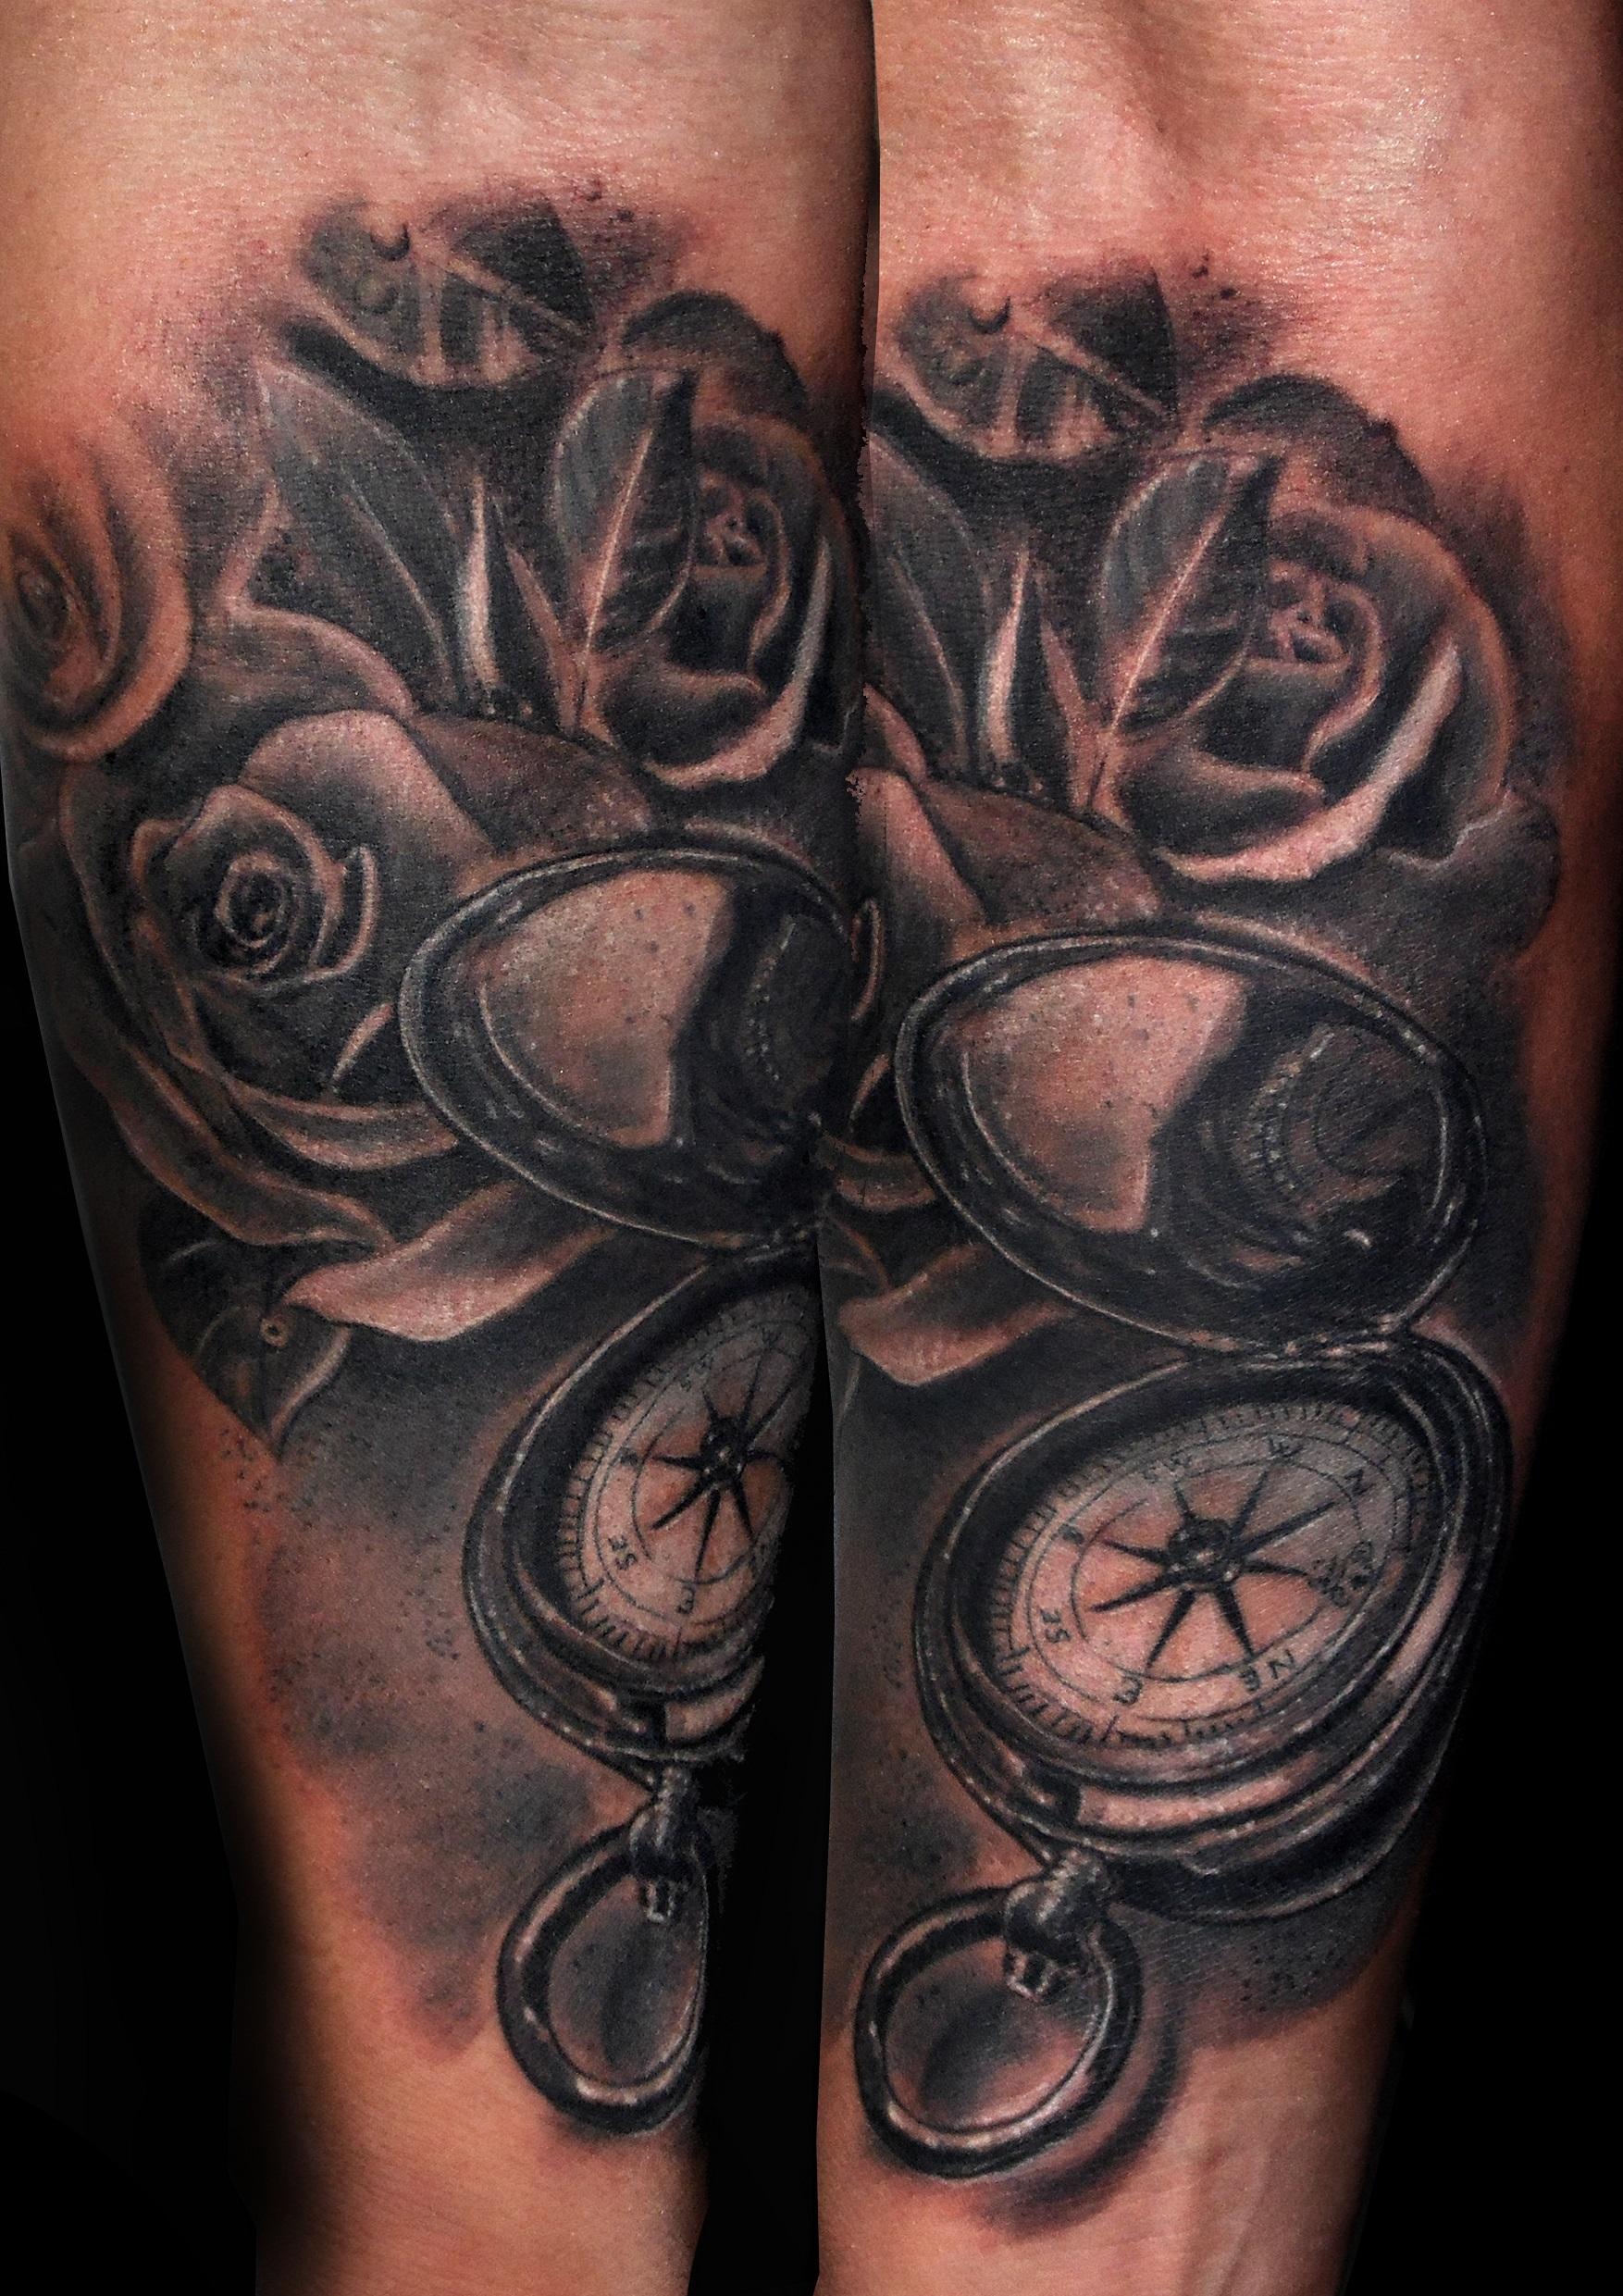 tattoo brujula rosas 13depicas tatuajes huesca jaca spain españa tatuajes ink antebrazo realista